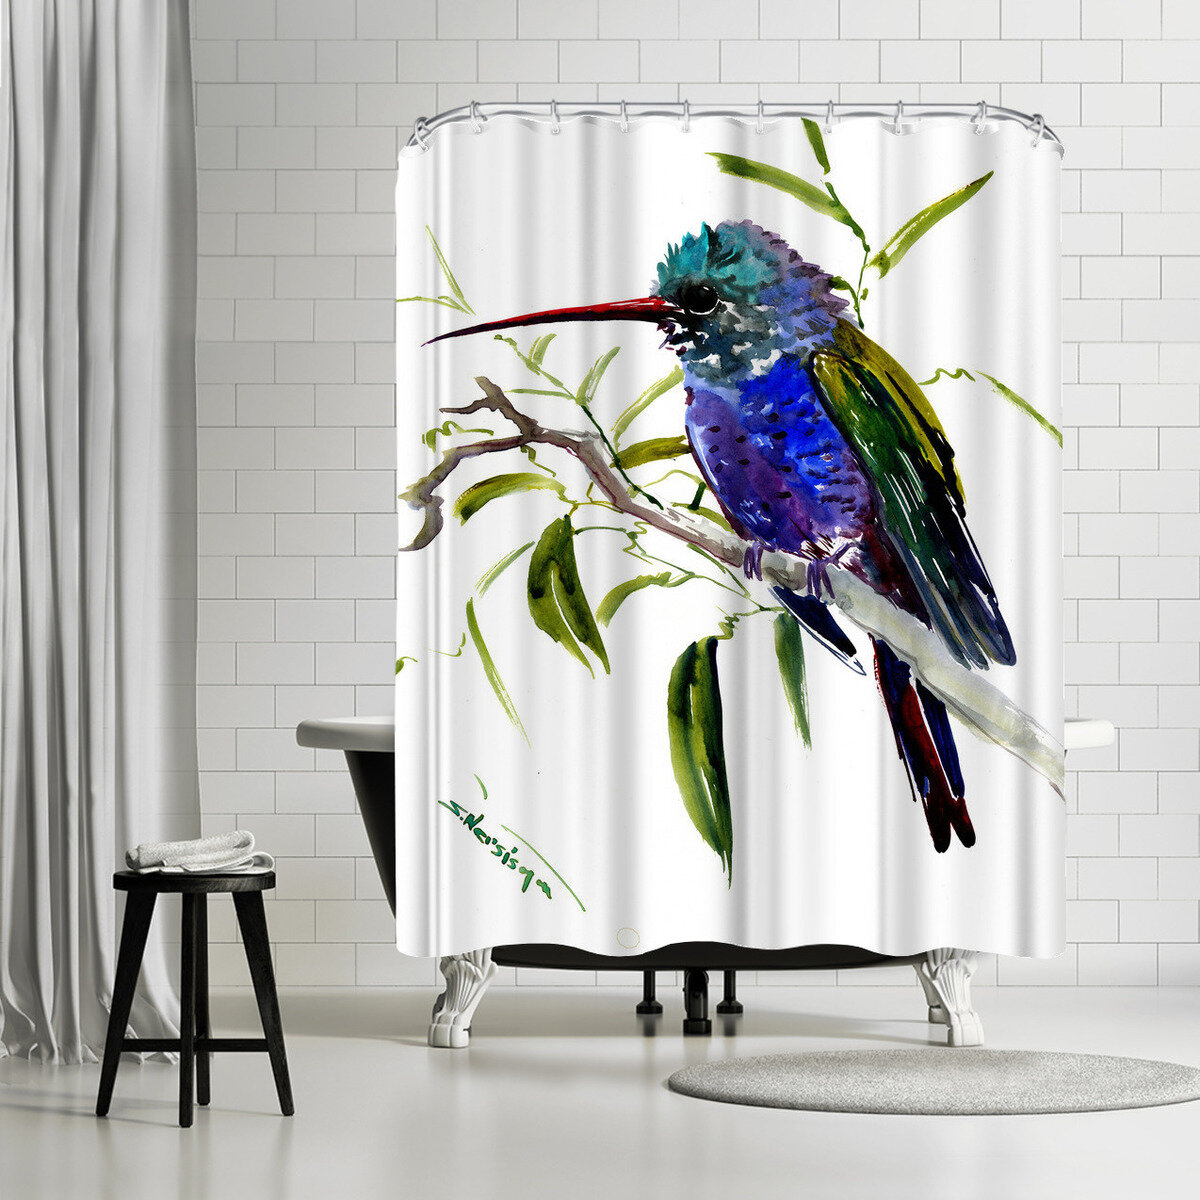 East Urban Home Suren Nersisyan Hummingbird Single Shower Curtain Wayfair